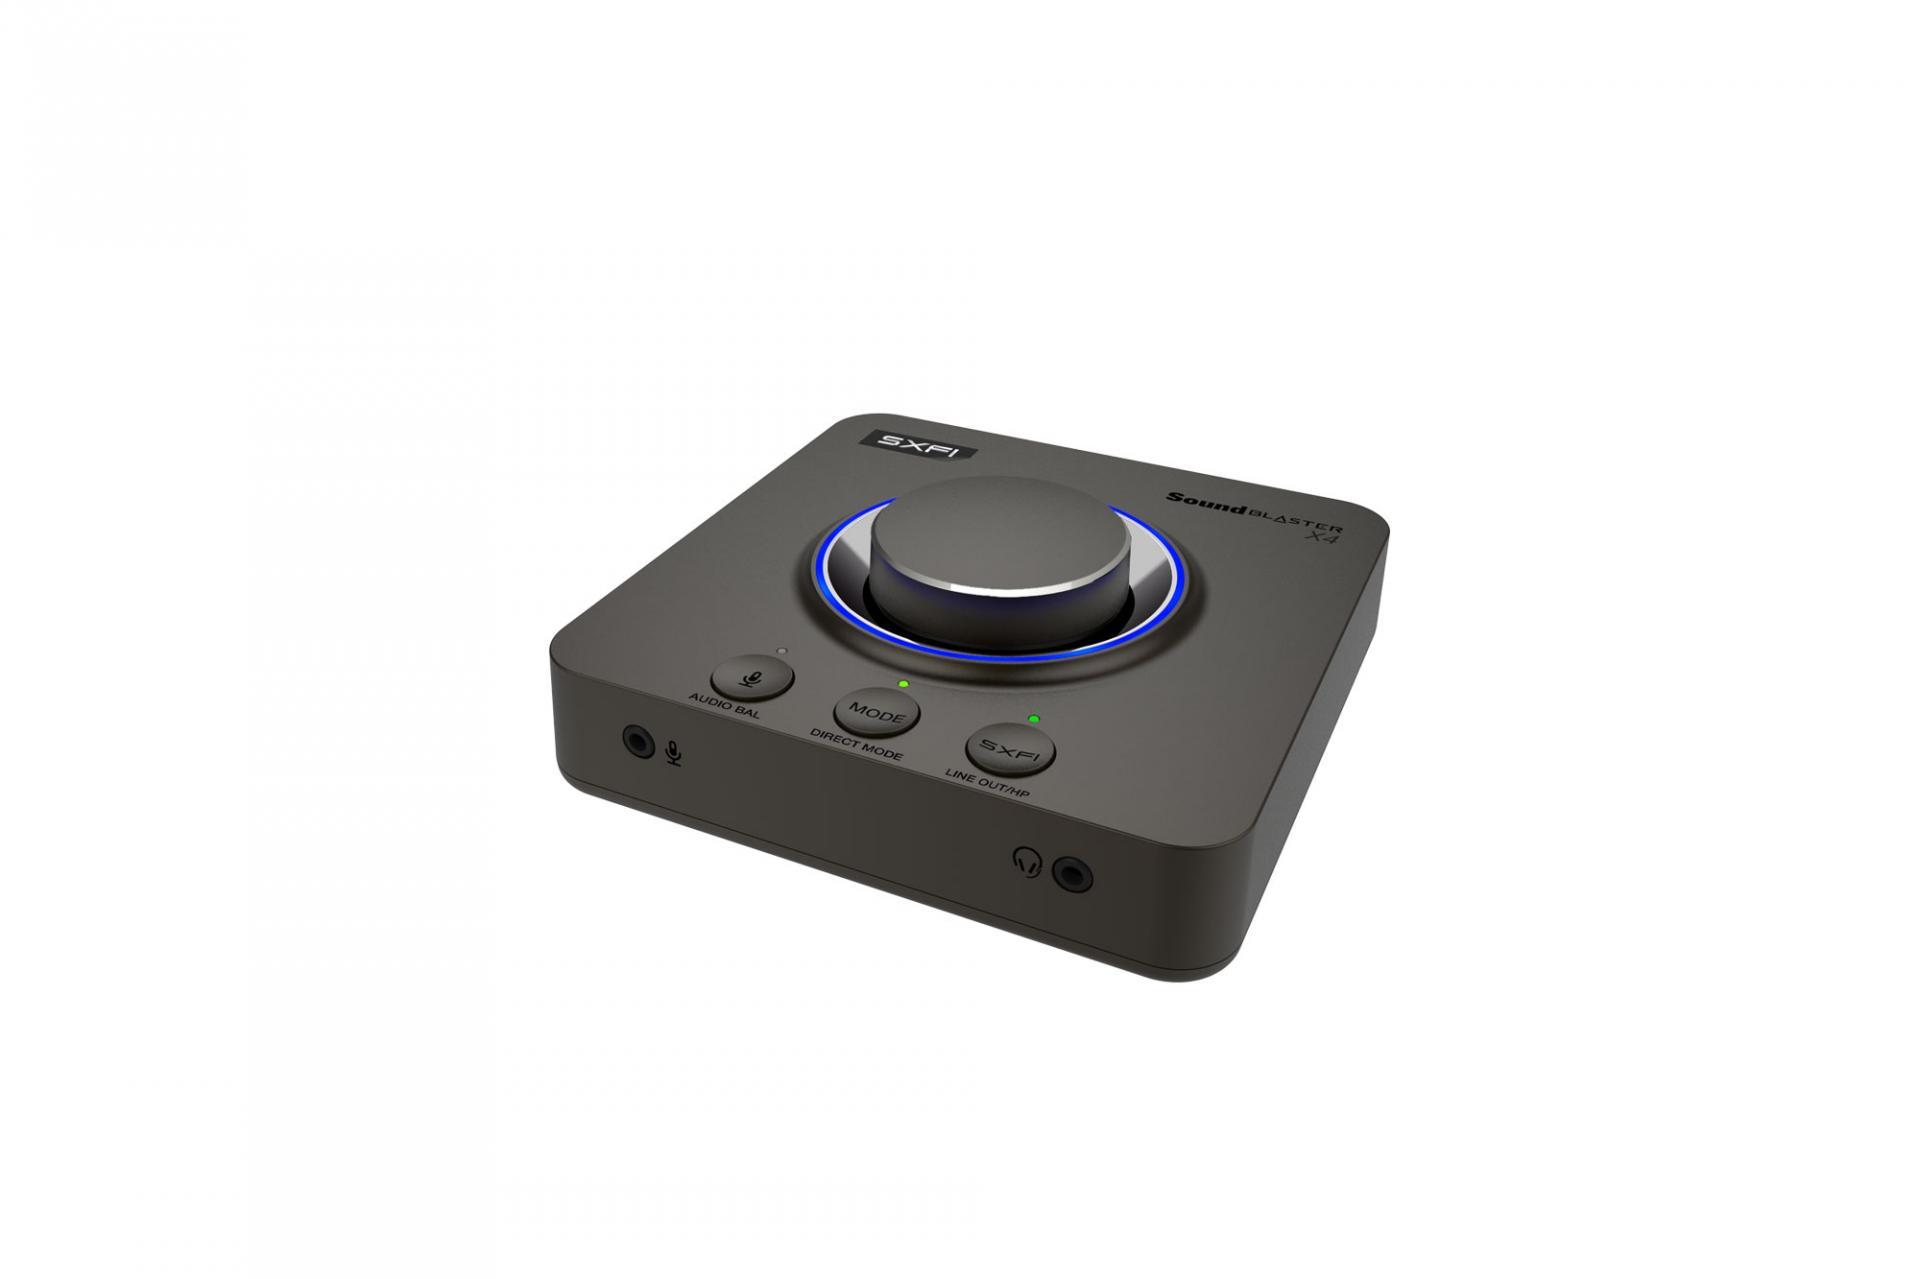 Creative анонсировала новую звуковую карту Sound Blaster X4